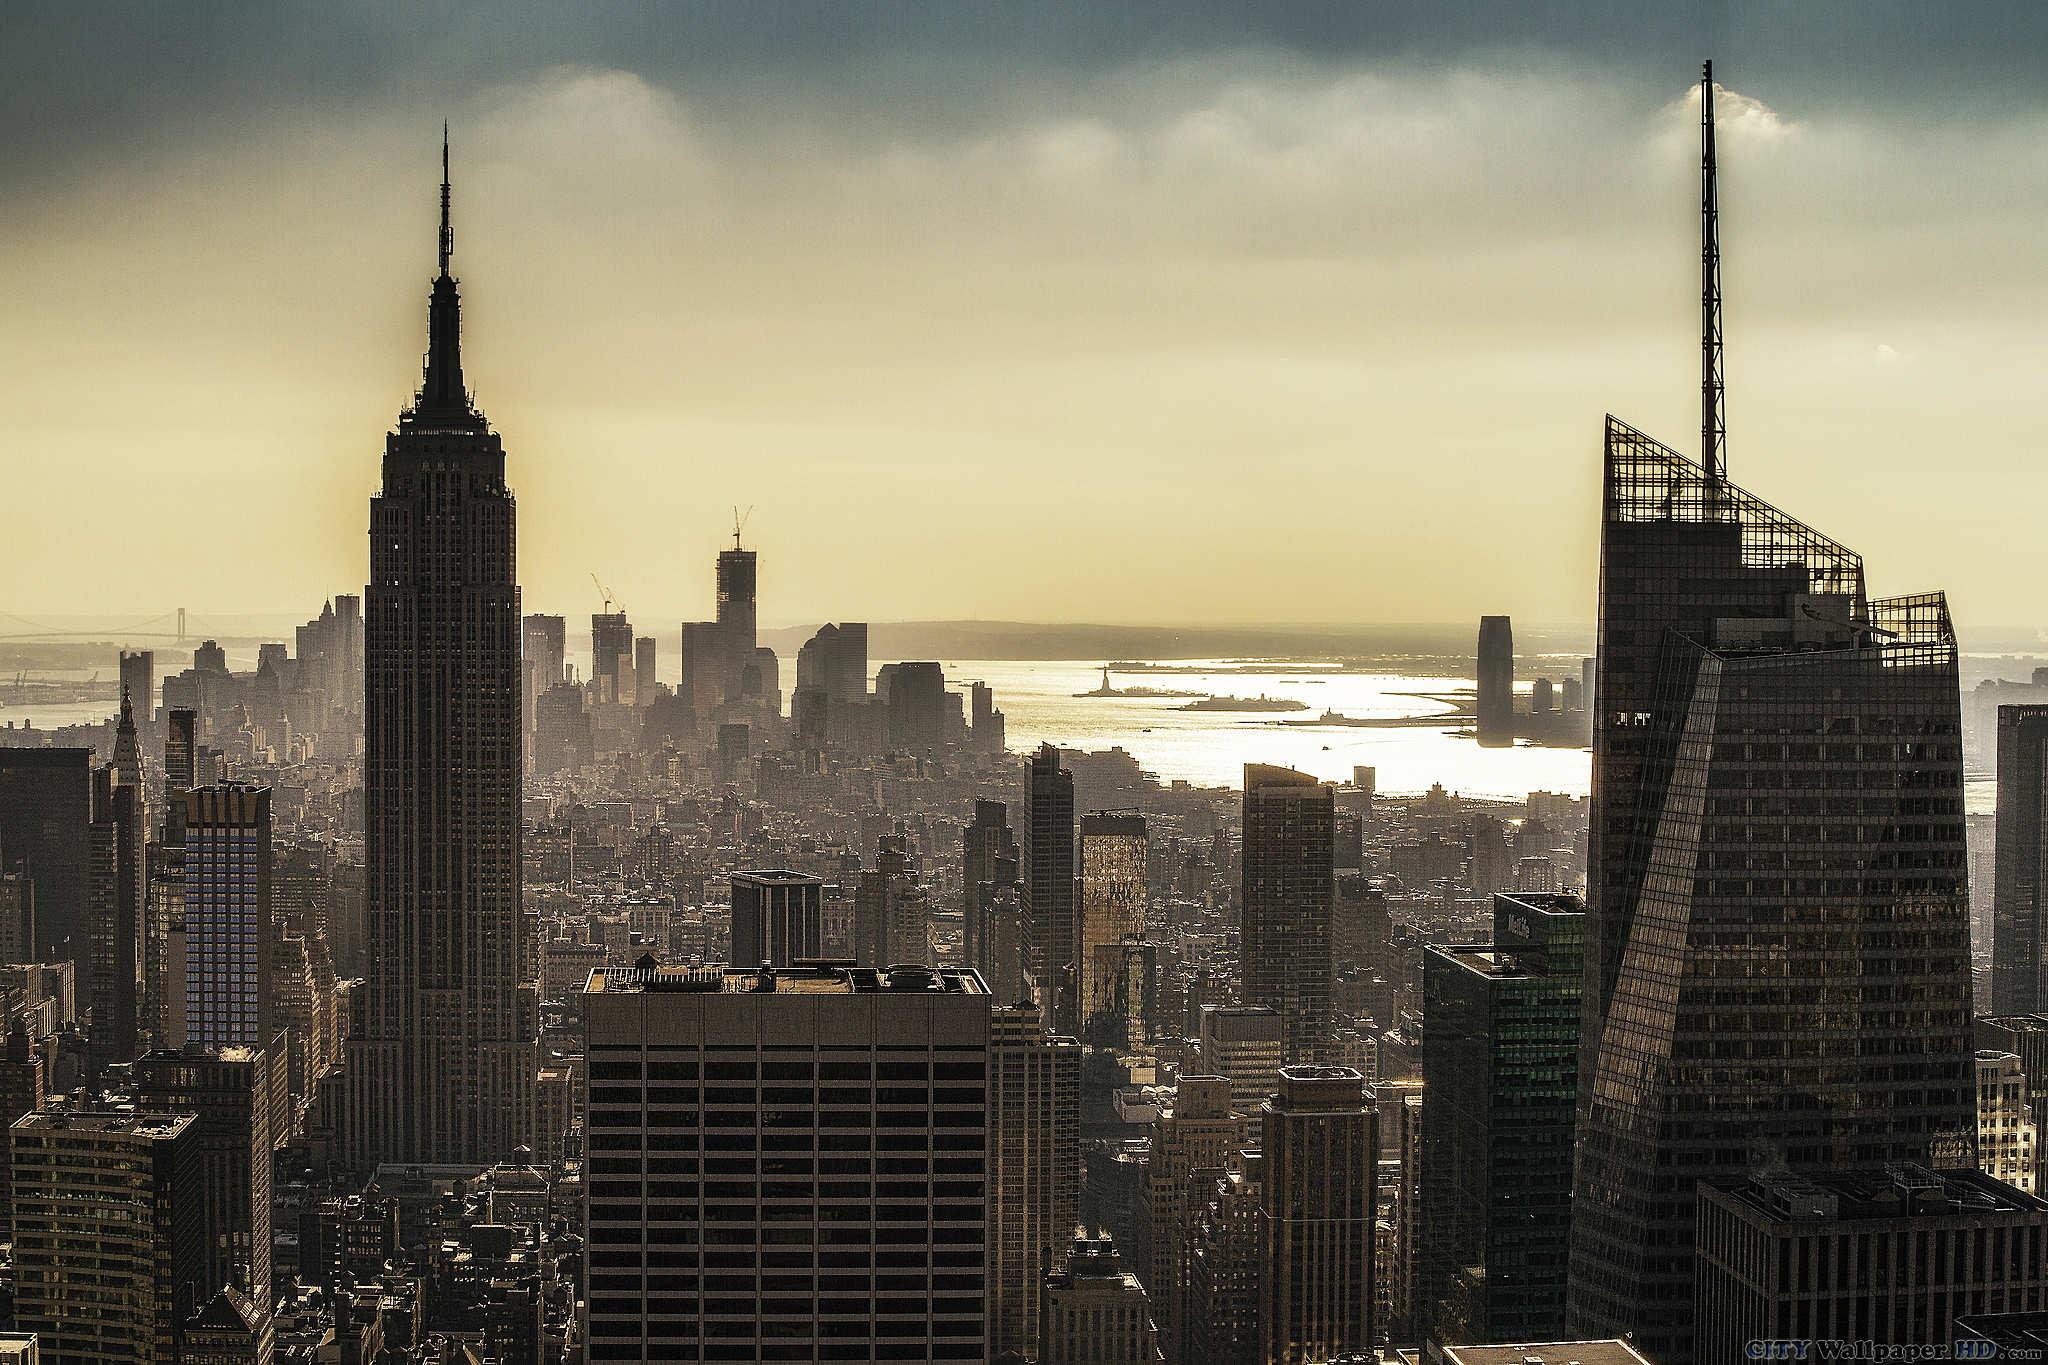 fond d 39 cran new york villes larges photos new york tats unis east river manhattan le. Black Bedroom Furniture Sets. Home Design Ideas